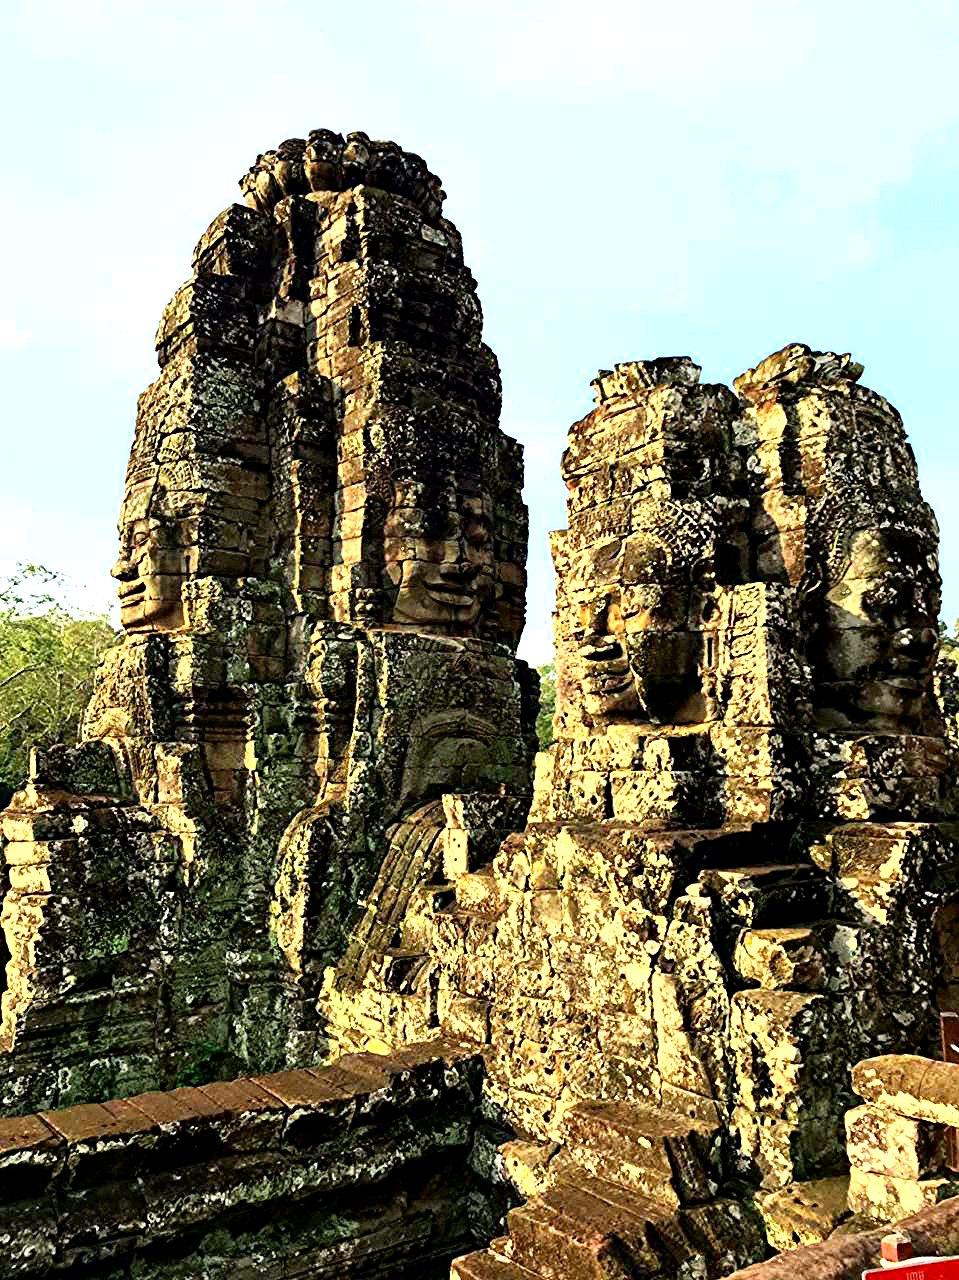 Елена Руденко (Валтея). Камбоджа. Ангкор. QRLIk0imWHg